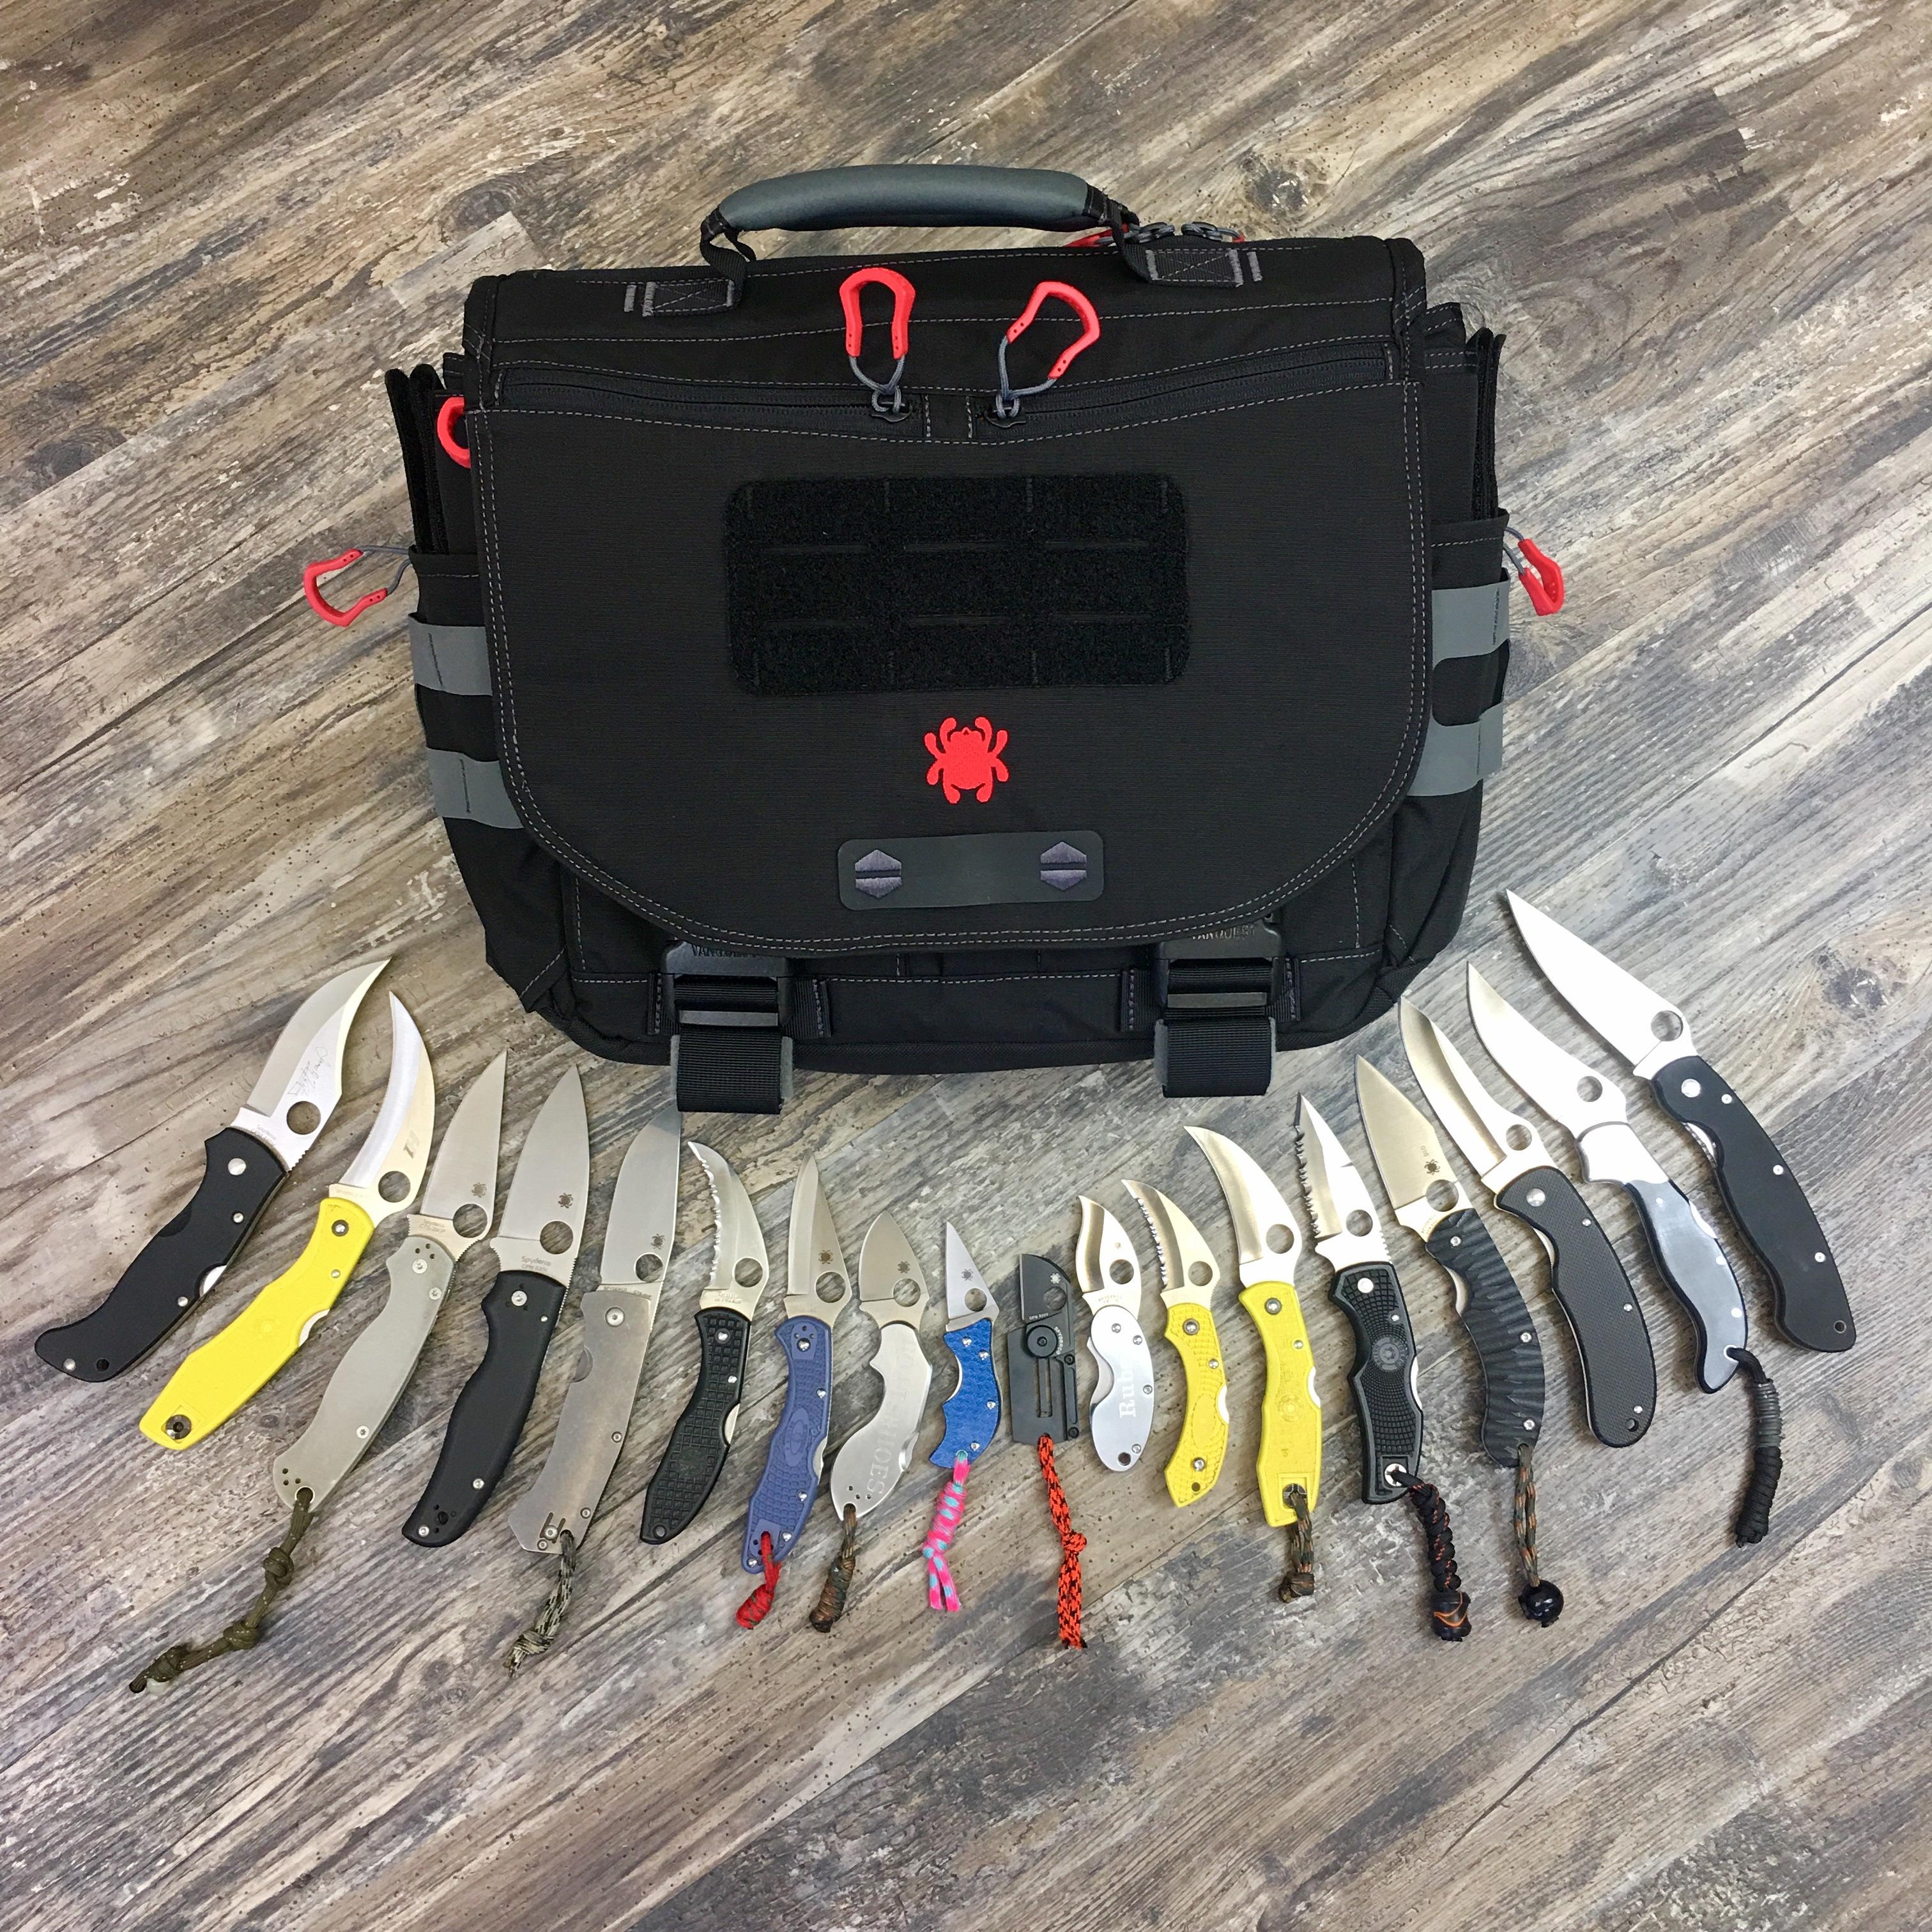 spyderco-envoy-13-knives.jpg